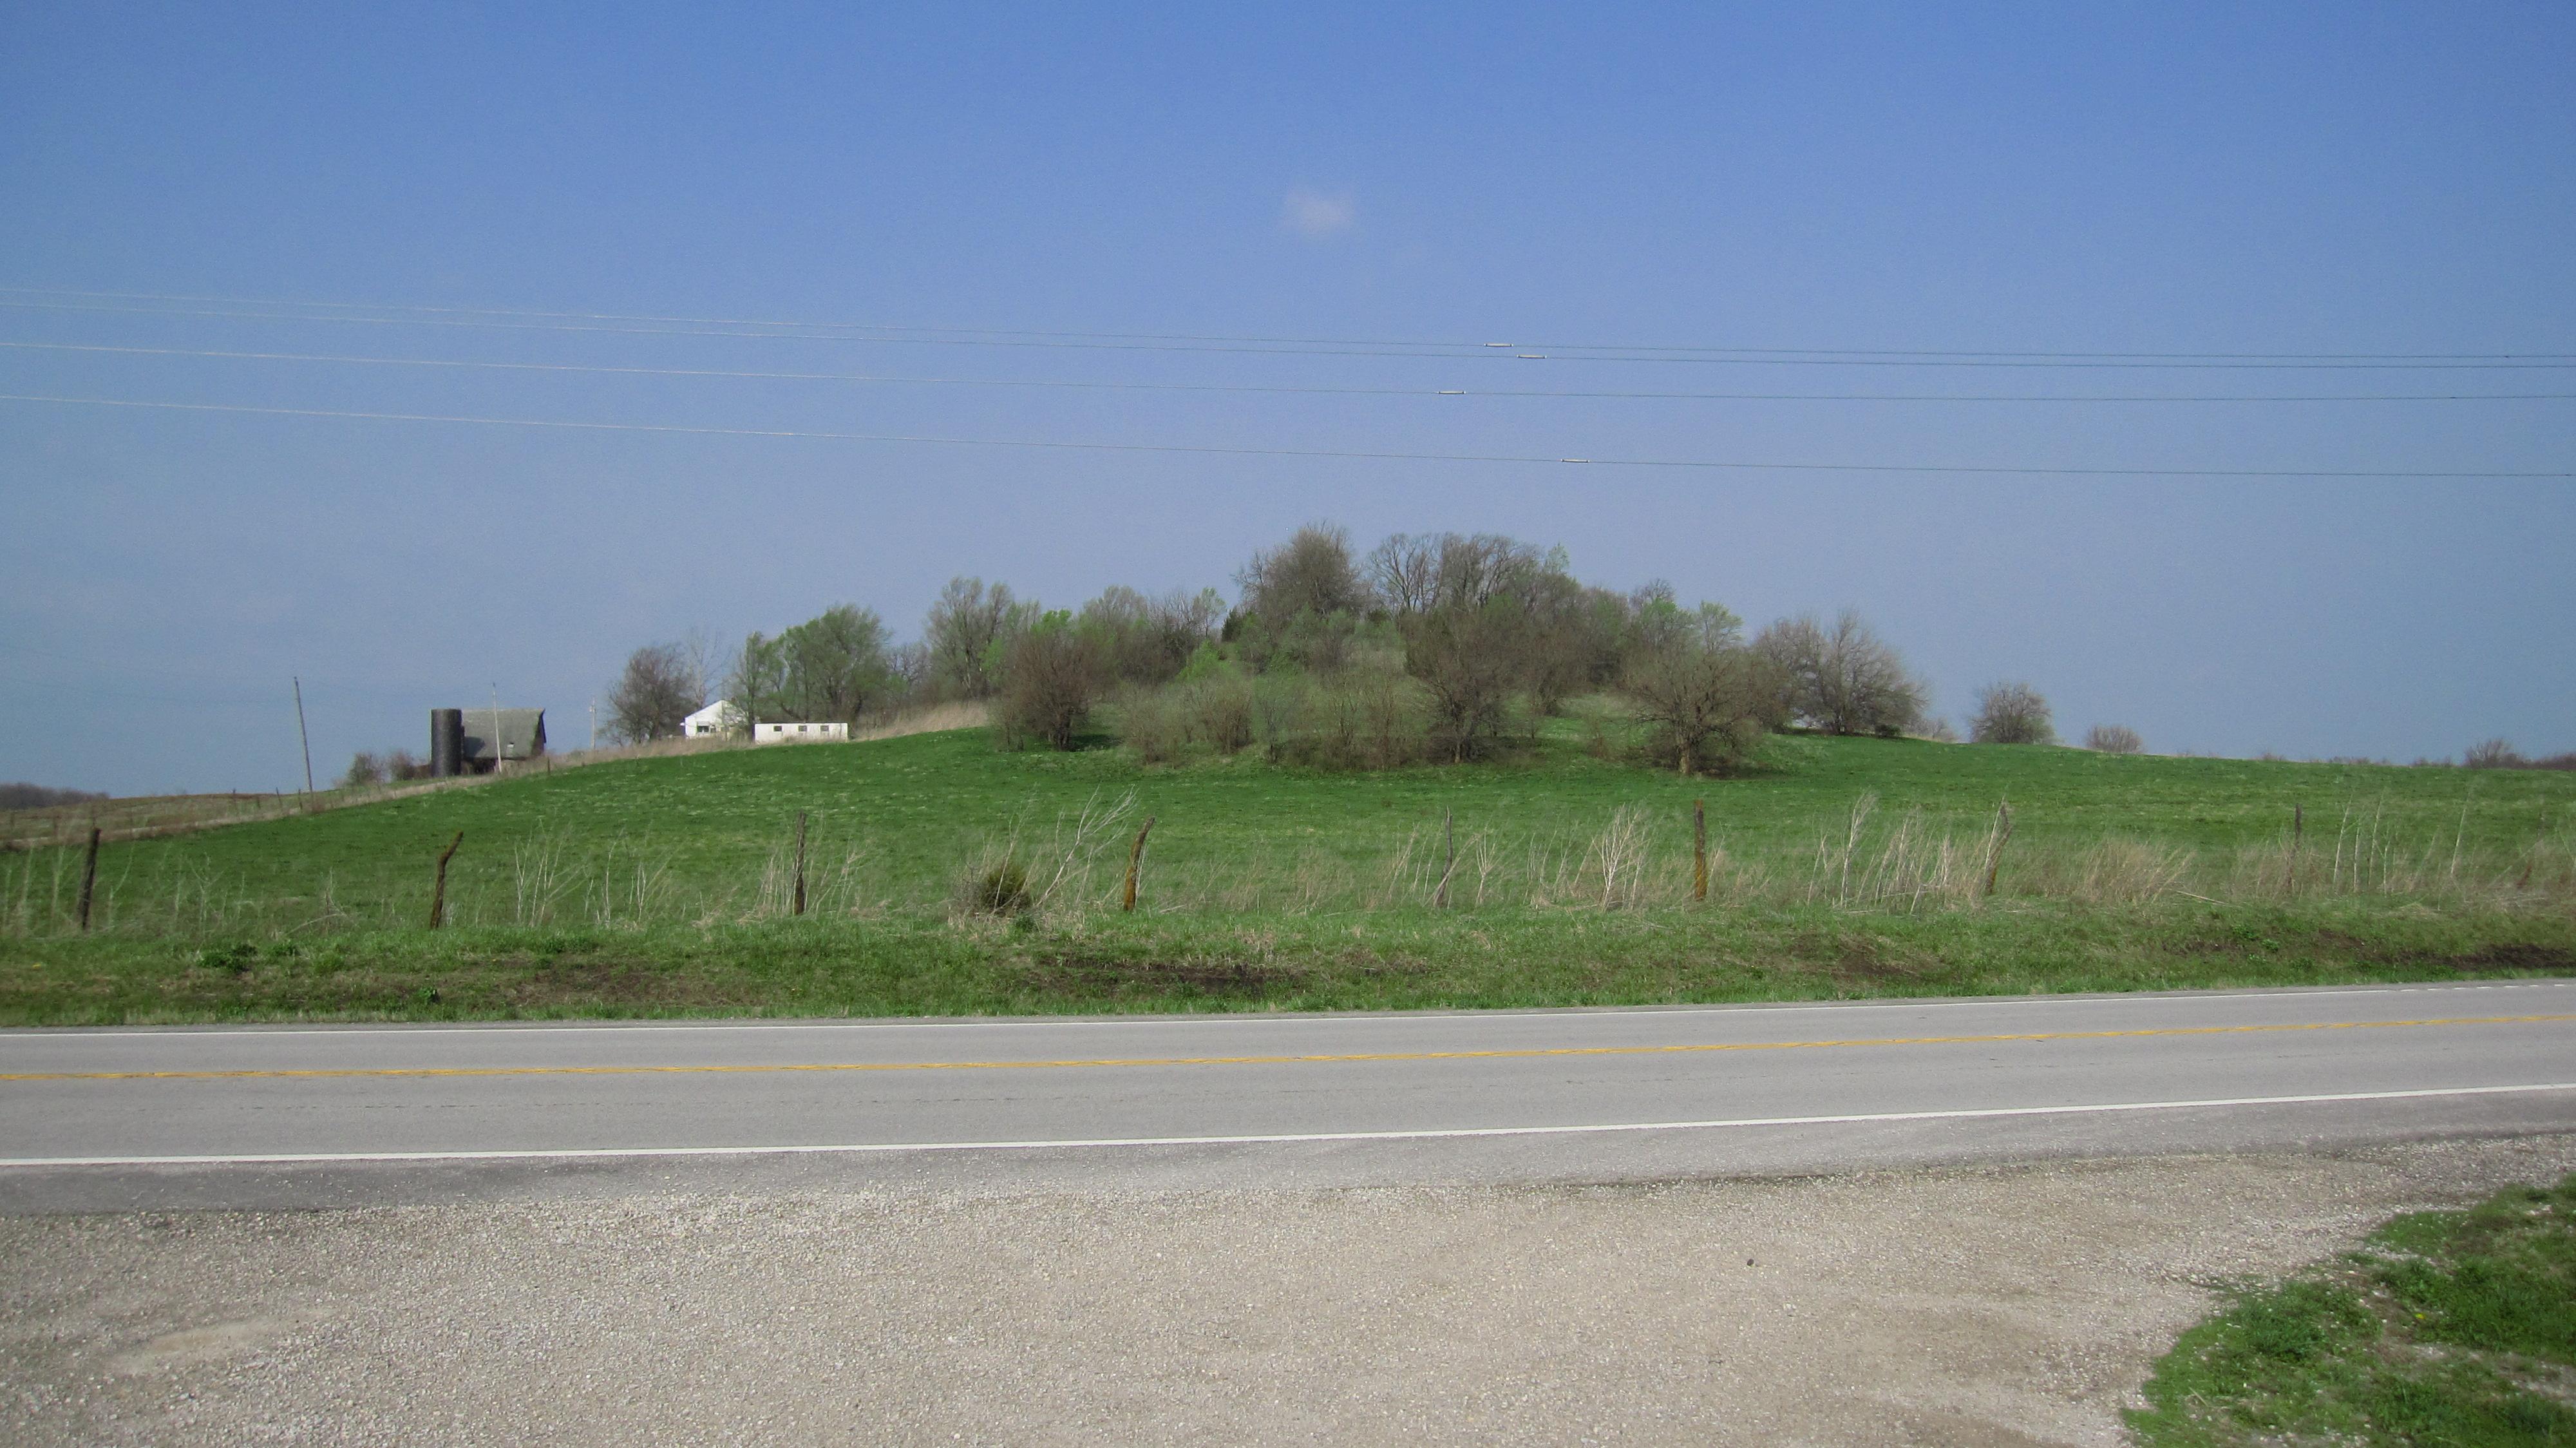 File:Old Indian Burial Mound, Tina, Missouri - panoramio jpg